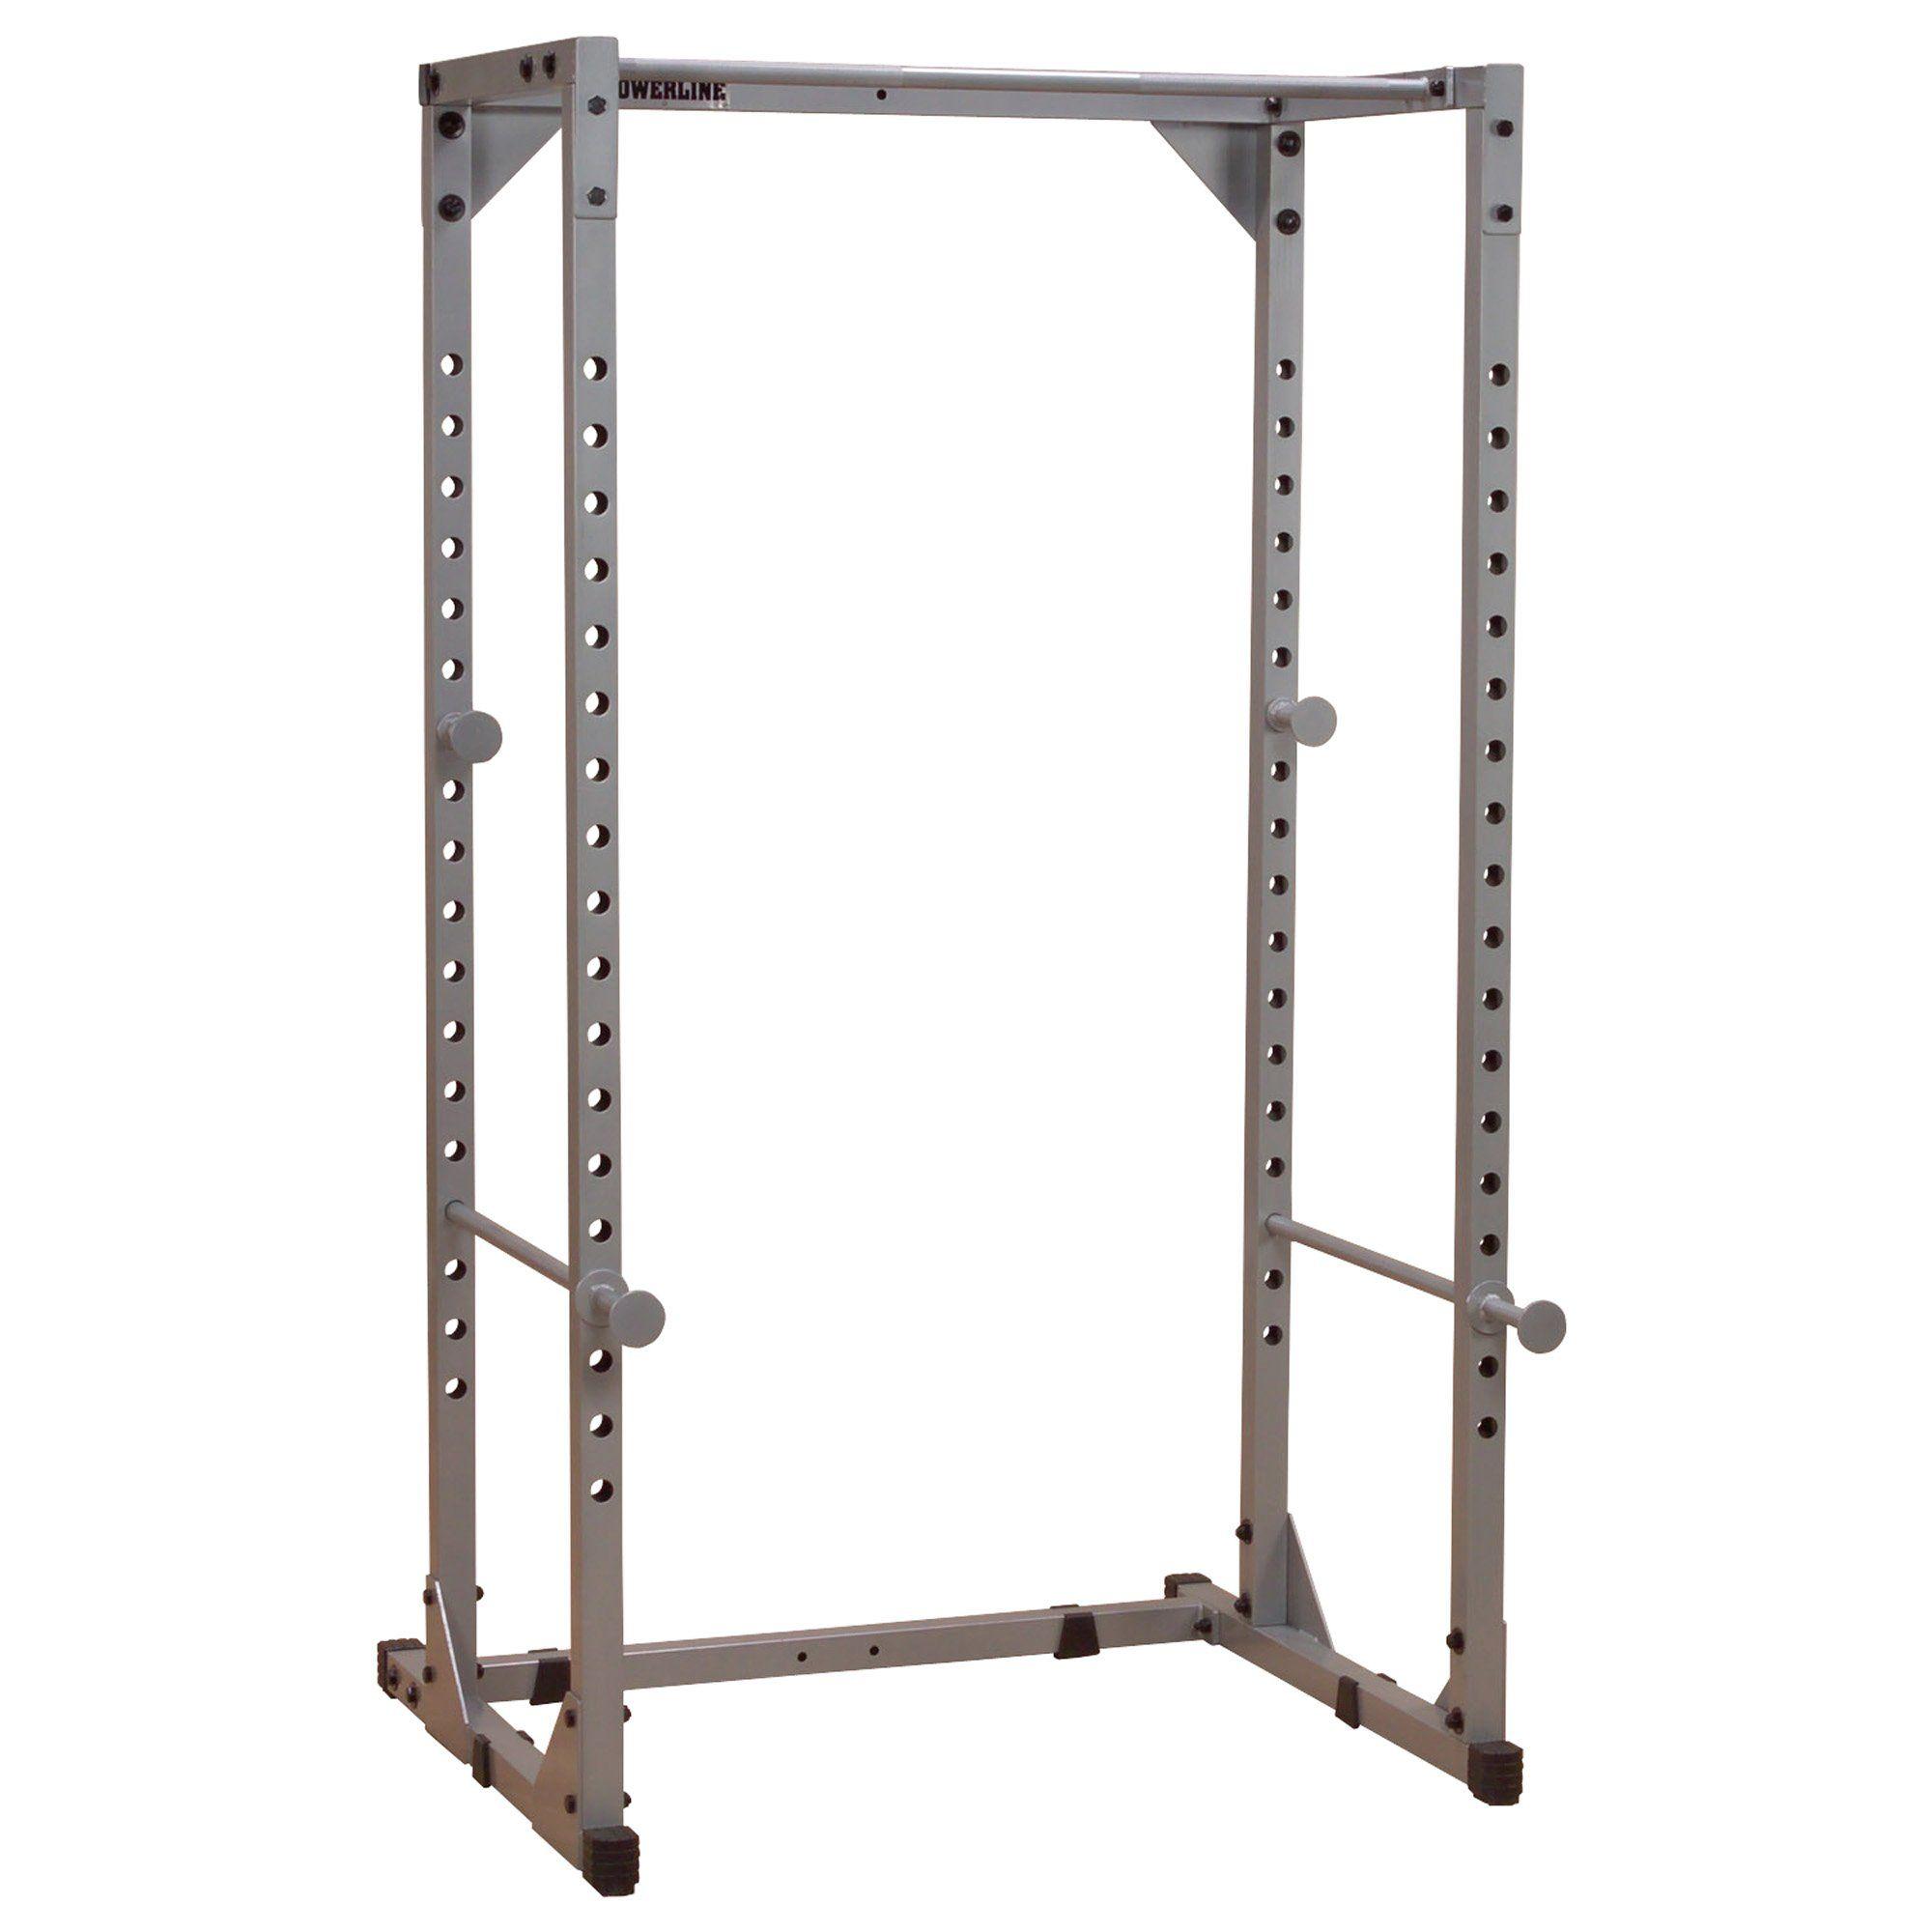 Powerline ppr200x power rack body solid power rack